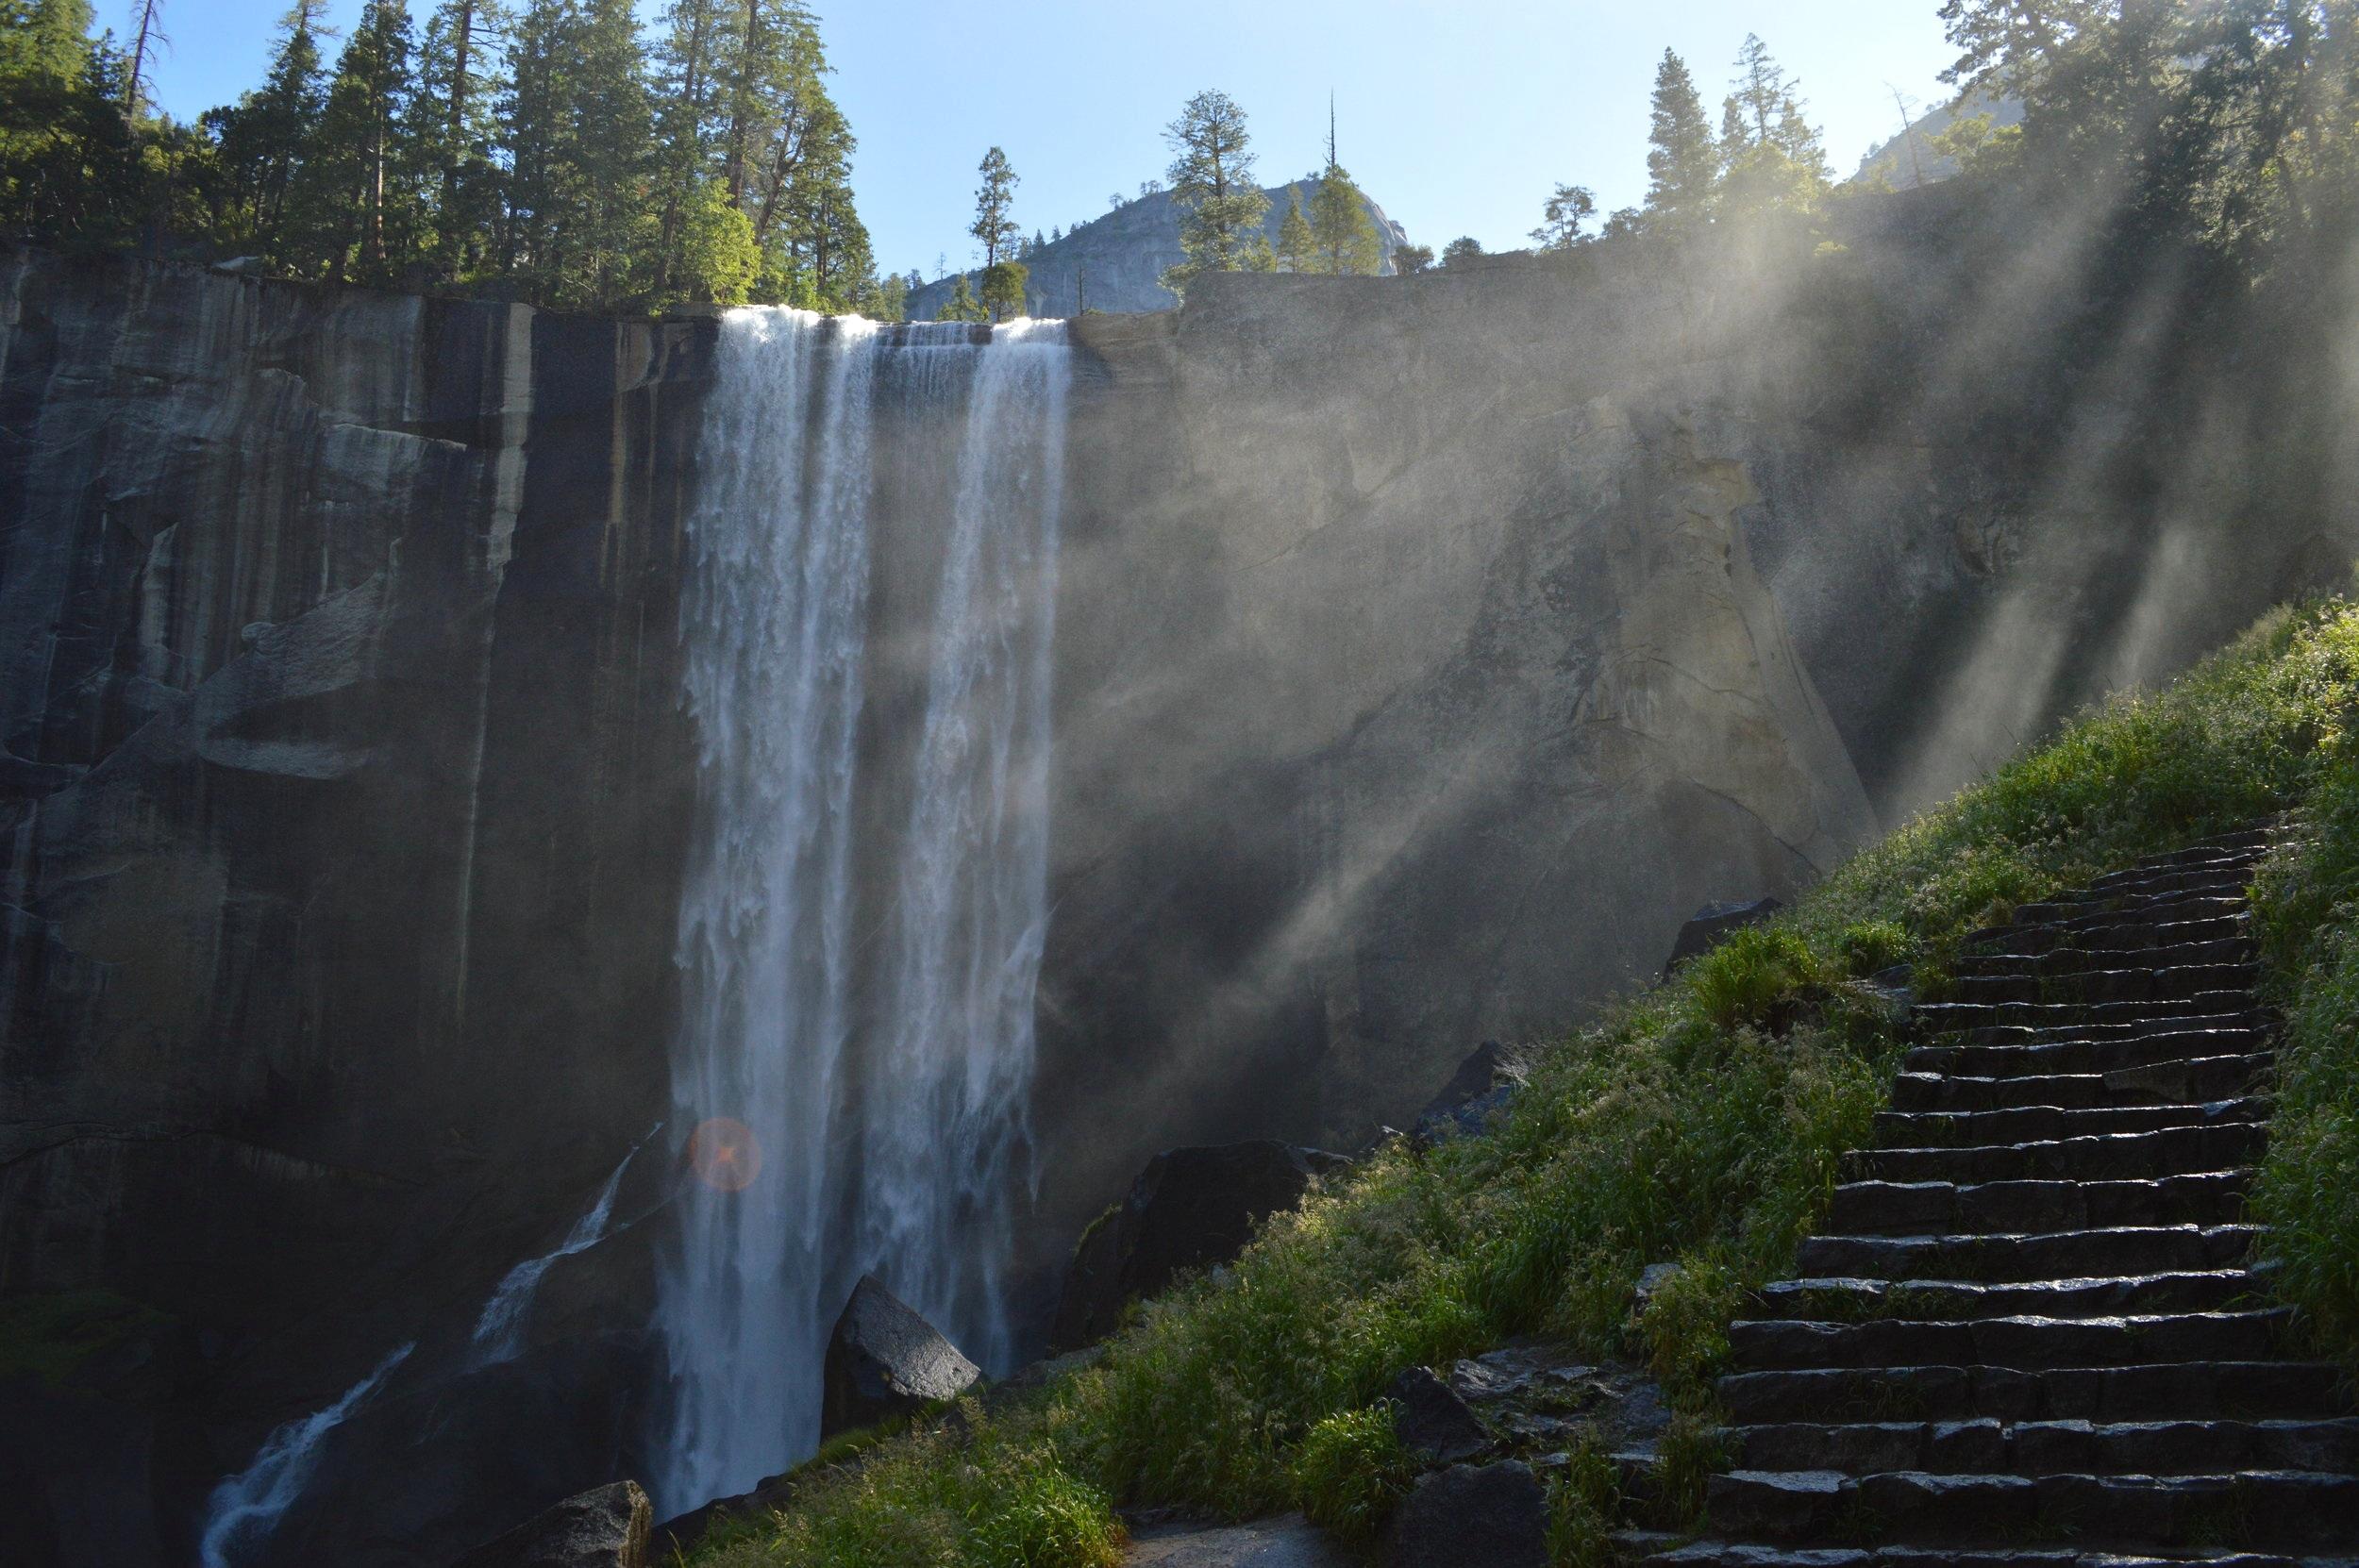 Mist Trail - Hiking in Yosemite